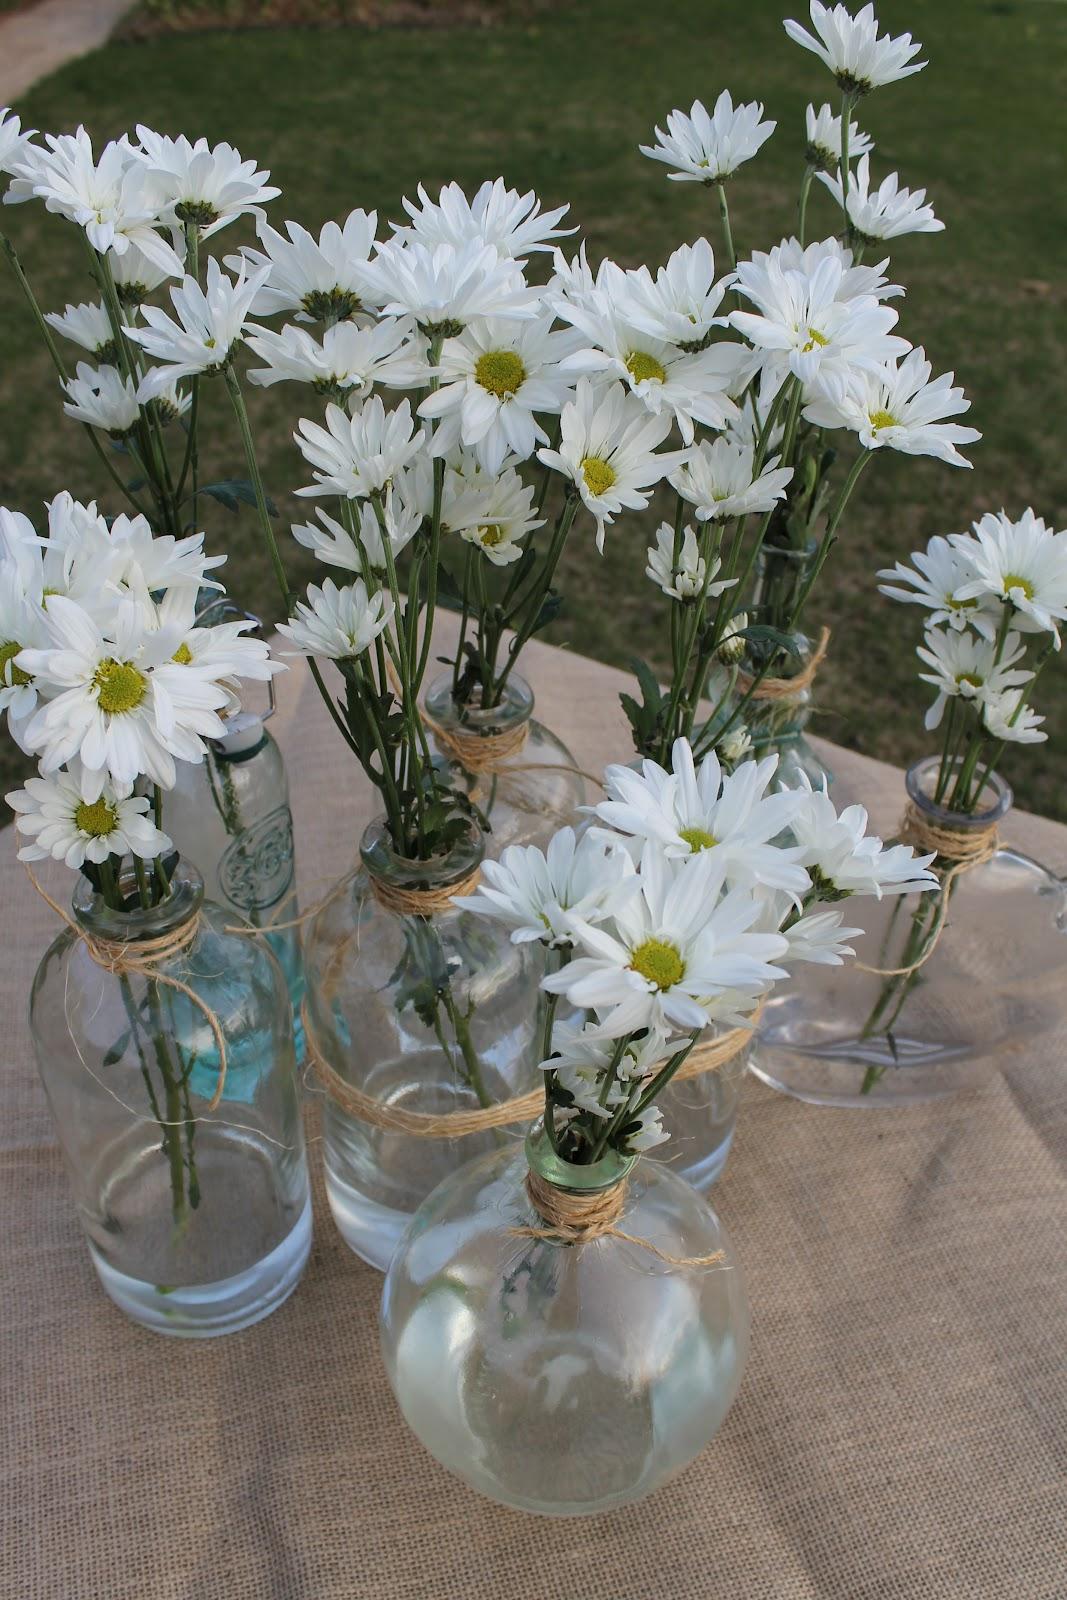 Pushing up daisies miss kopy kat daisies in glass vases reviewsmspy